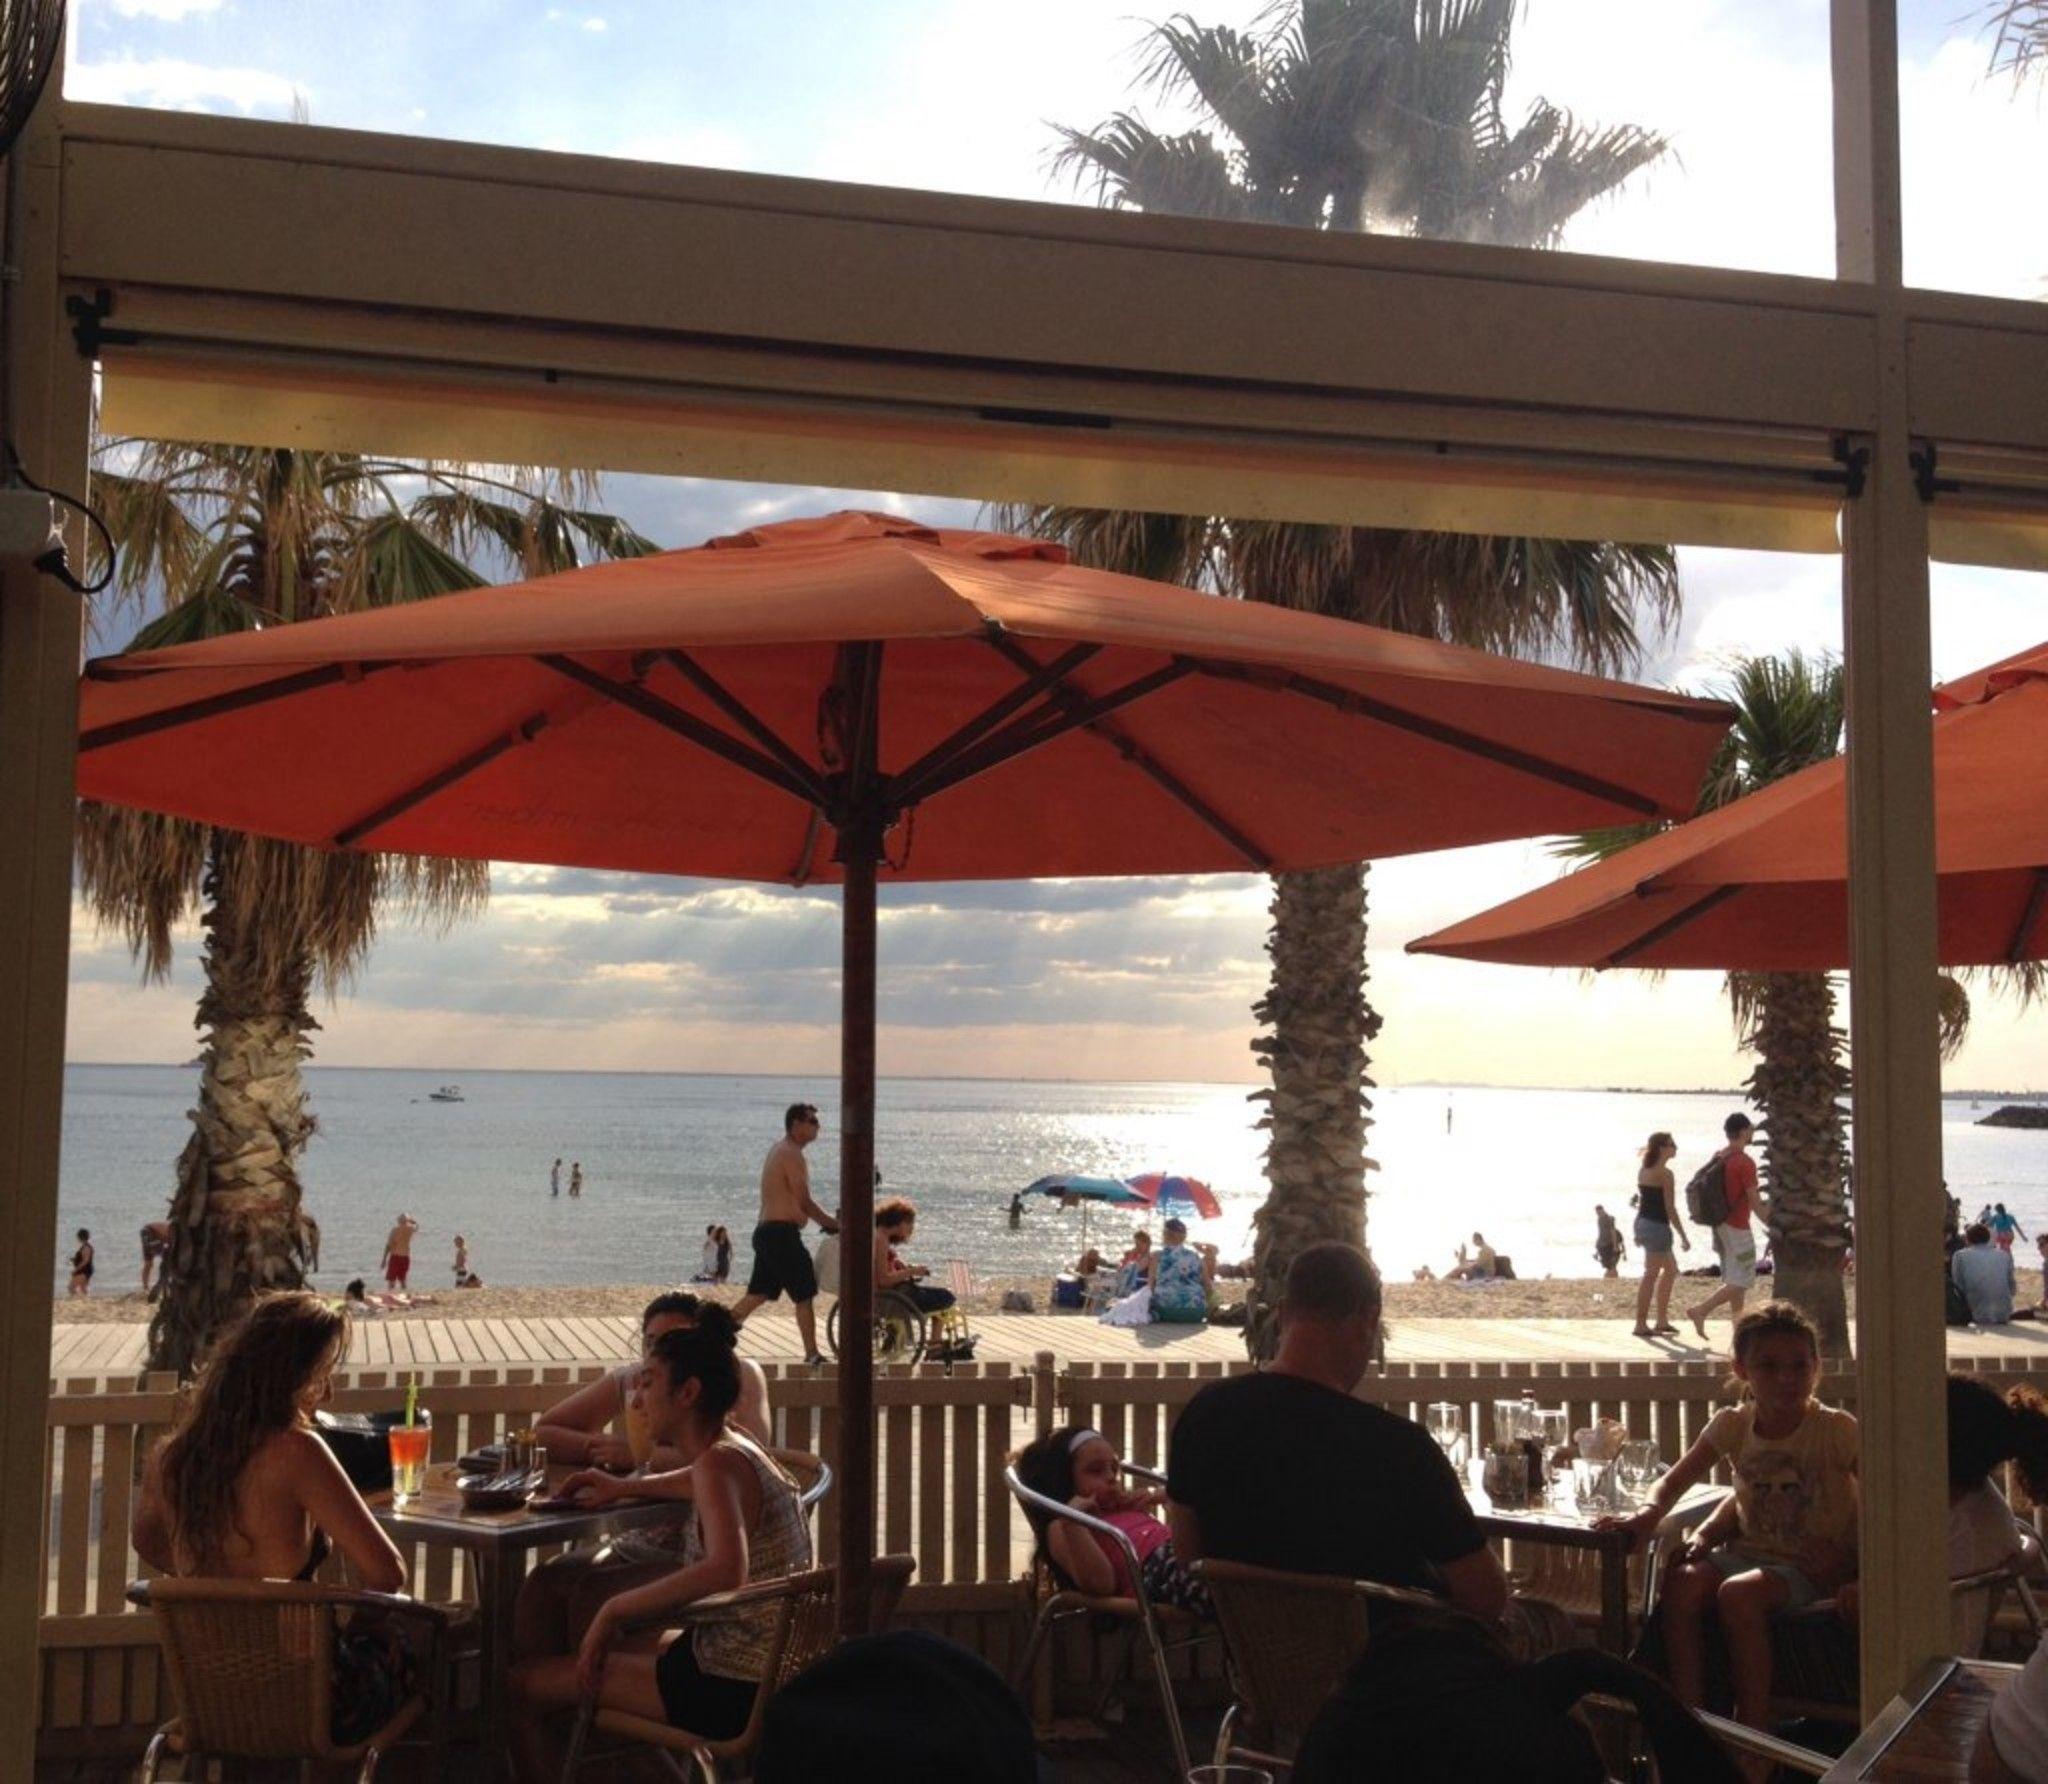 Beachcomber Cafe St Kilda Patio Fun Places To Go Outdoor Decor